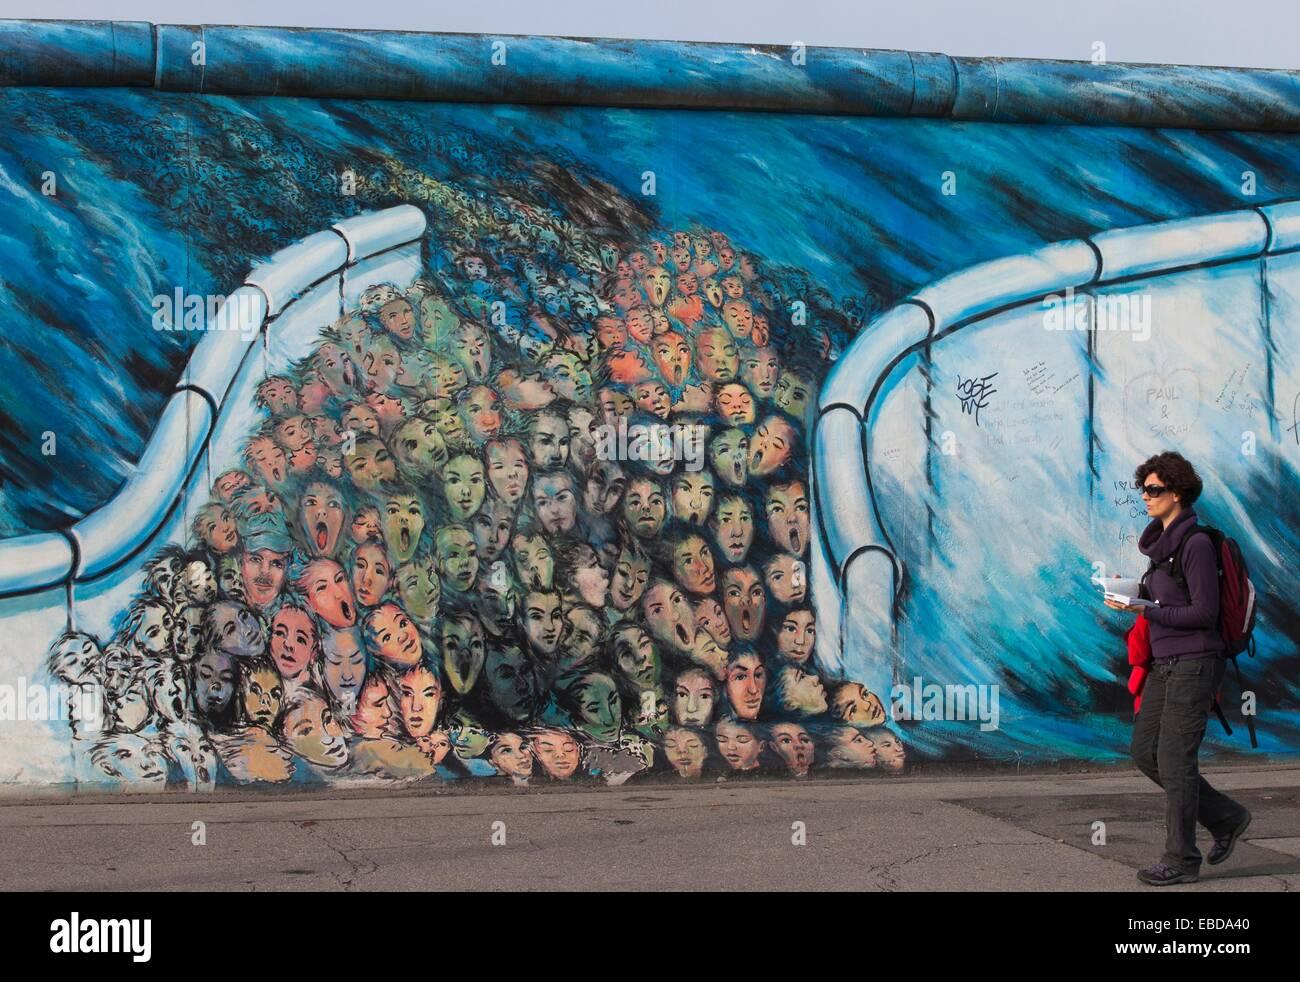 Art Berlin Berlin Wall Color Image Day East Side East Side Gallery Europe  Friedrichshain Gallery Germany Germay Graffiti